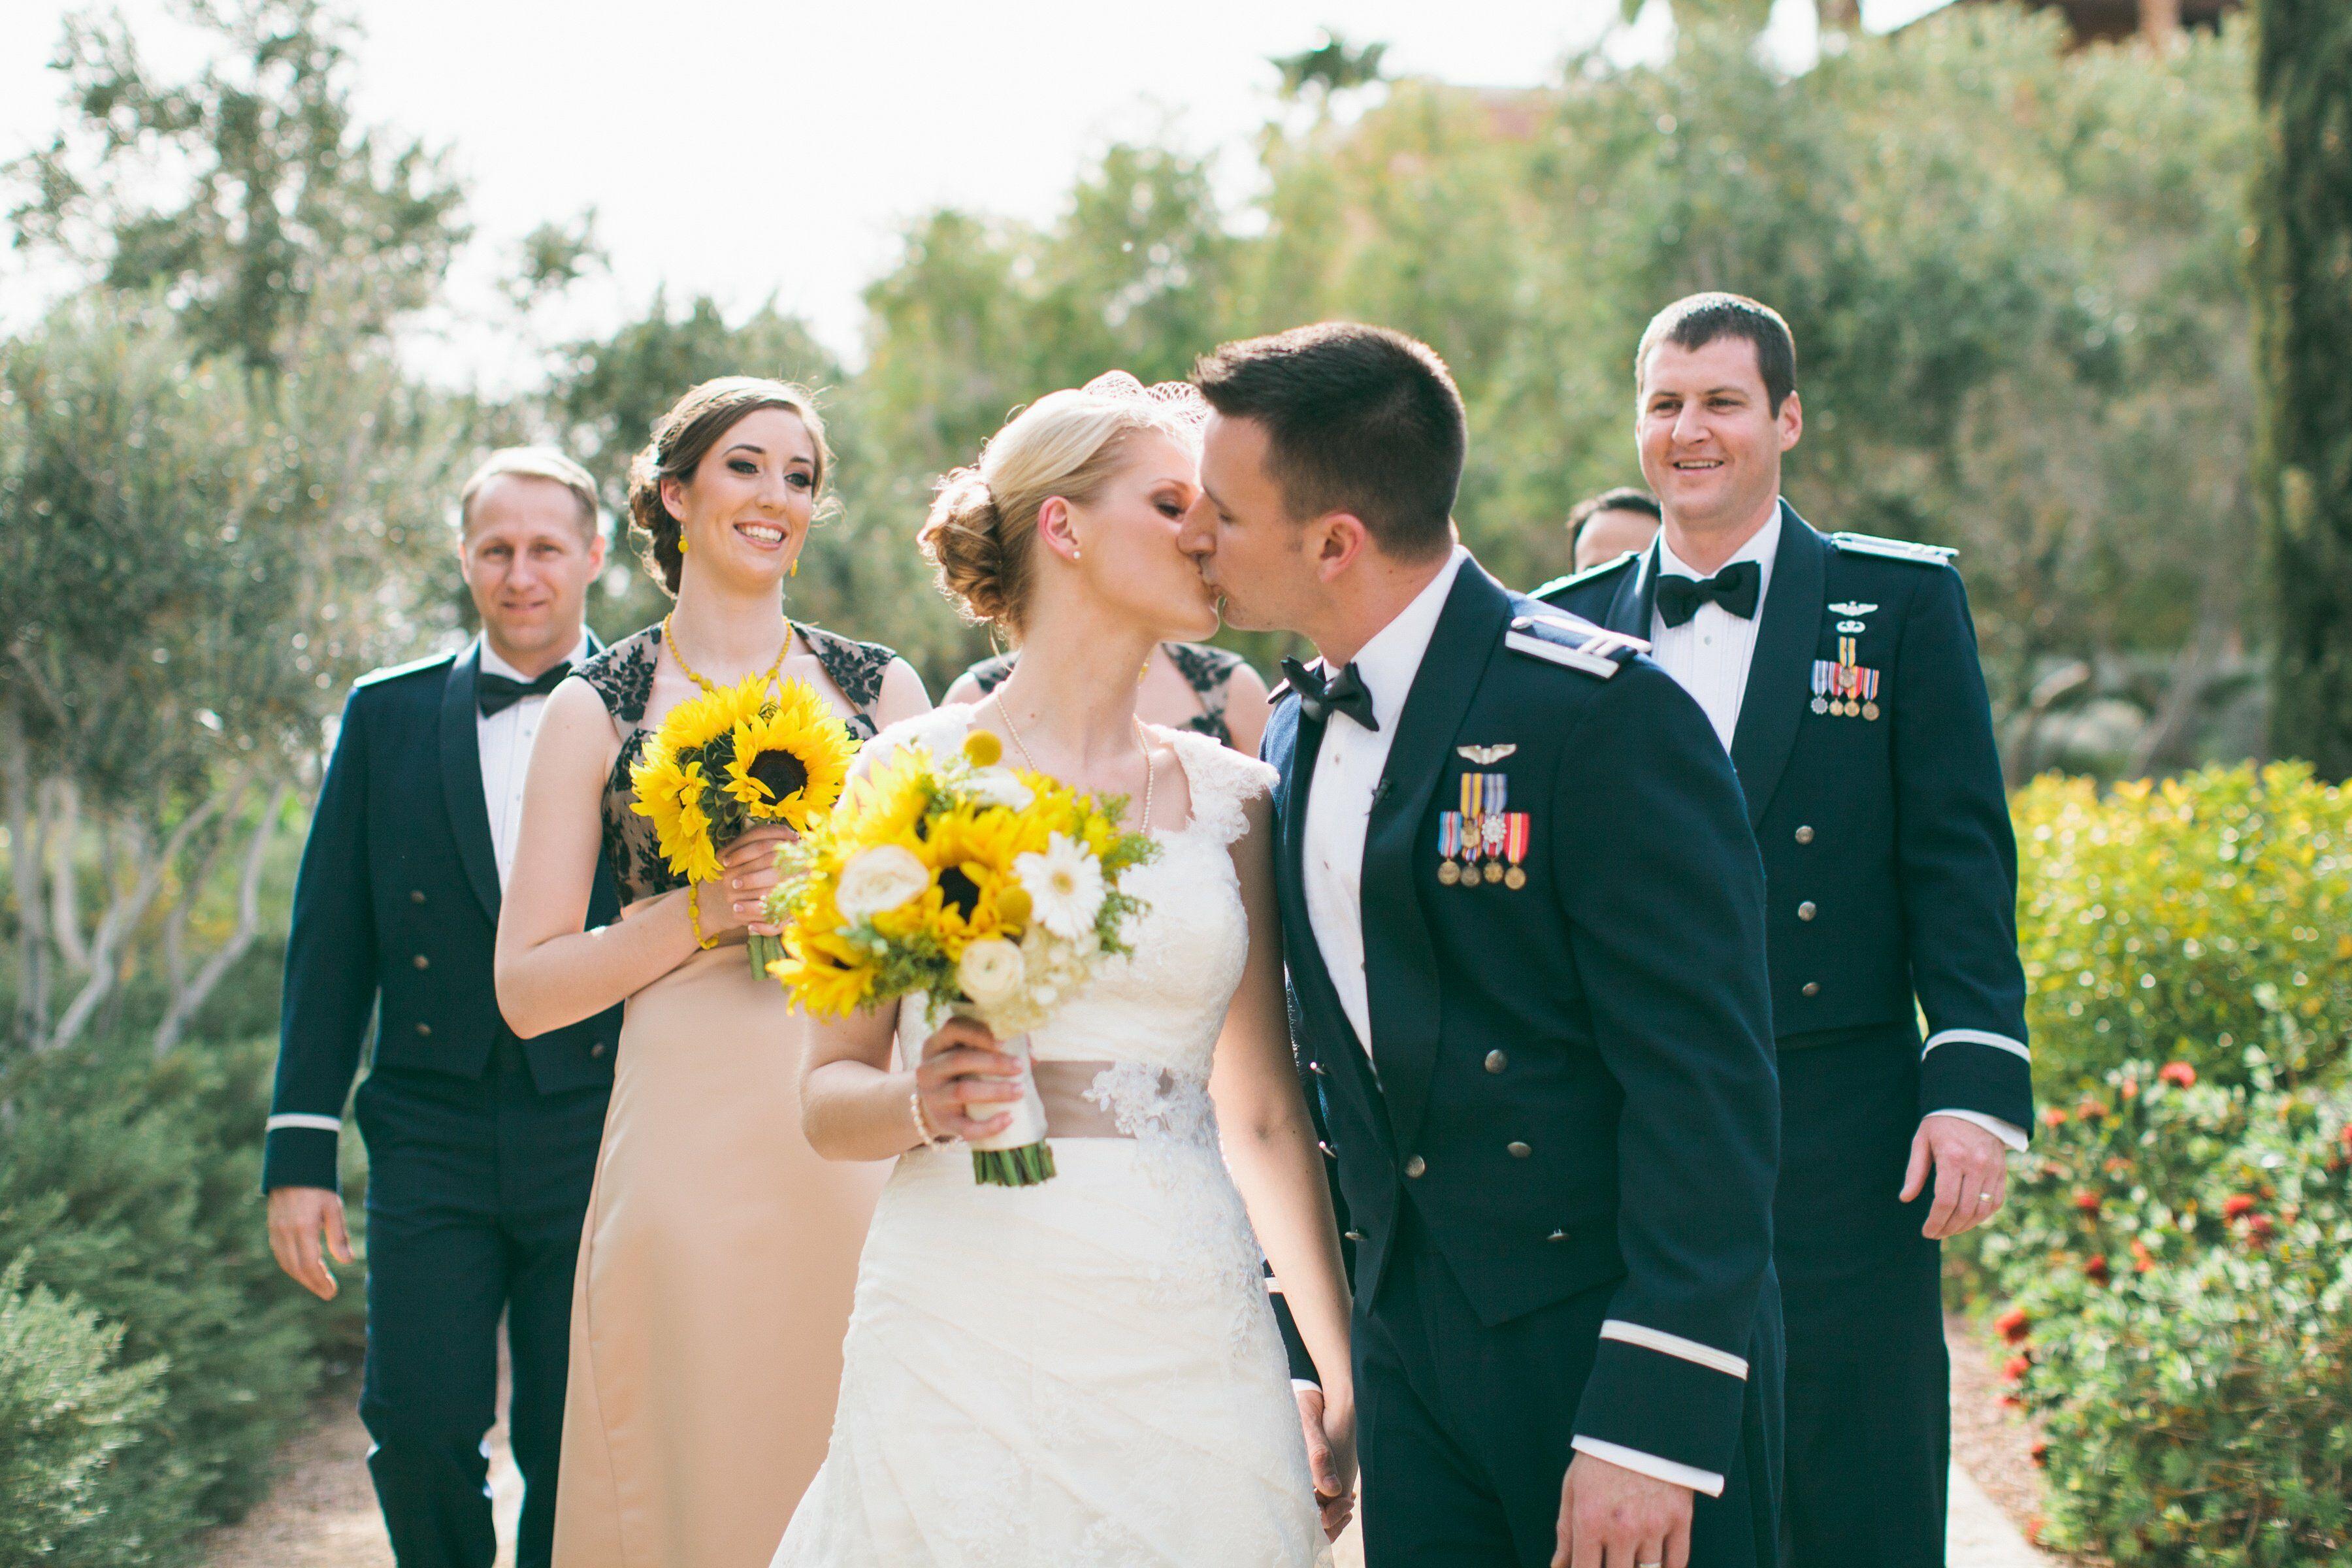 A Westin Lake Las Vegas Wedding In Henderson, Nevada